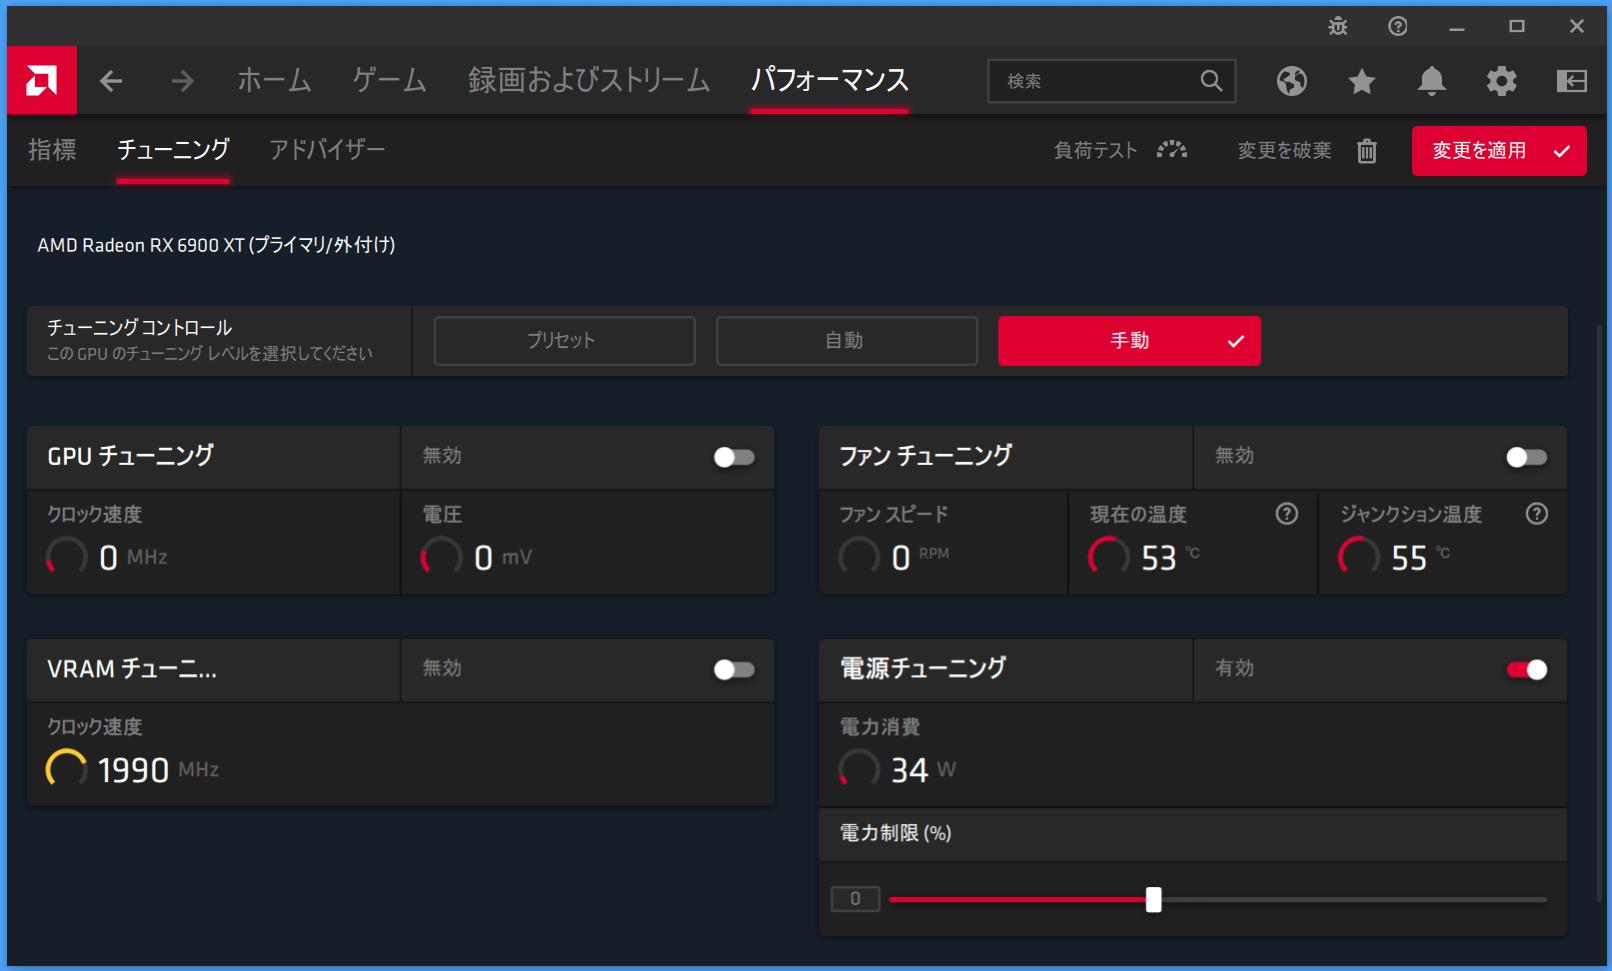 Radeon RX 6900 XT_Radeon-Setting_6_Power